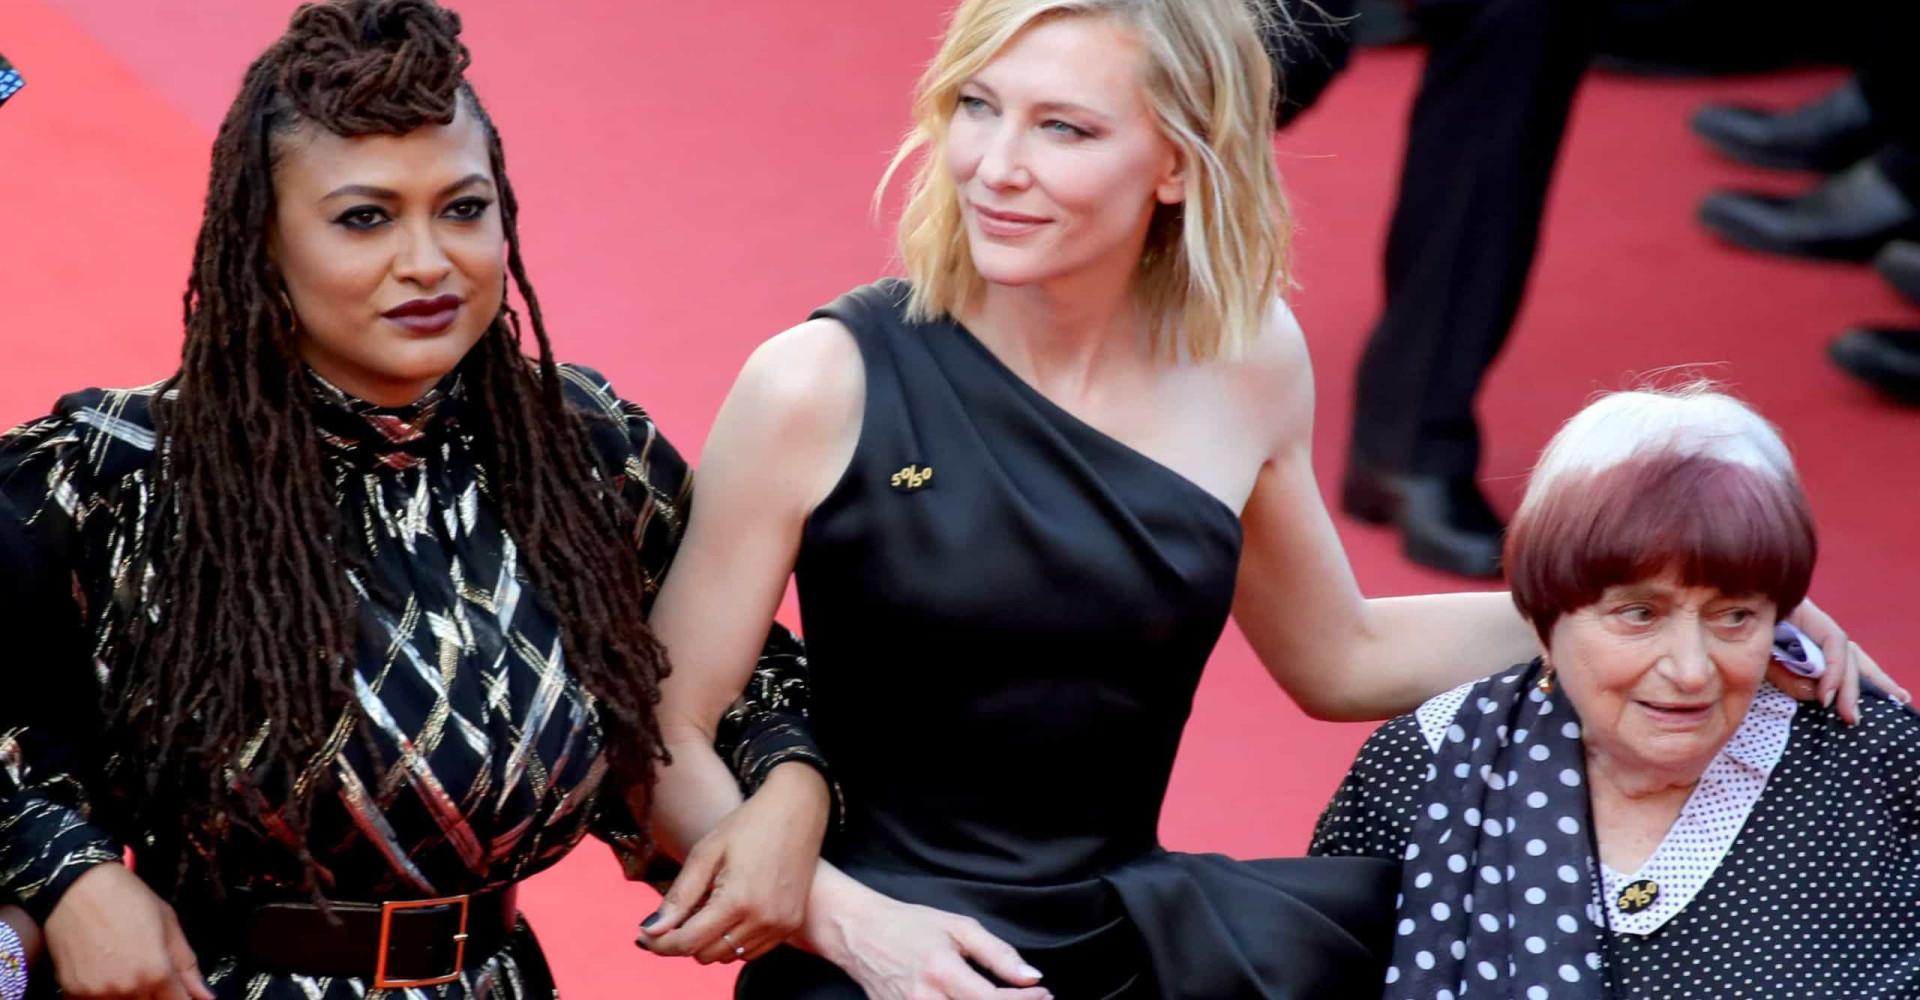 Fotos del Festival de Cannes que pasaron a la historia